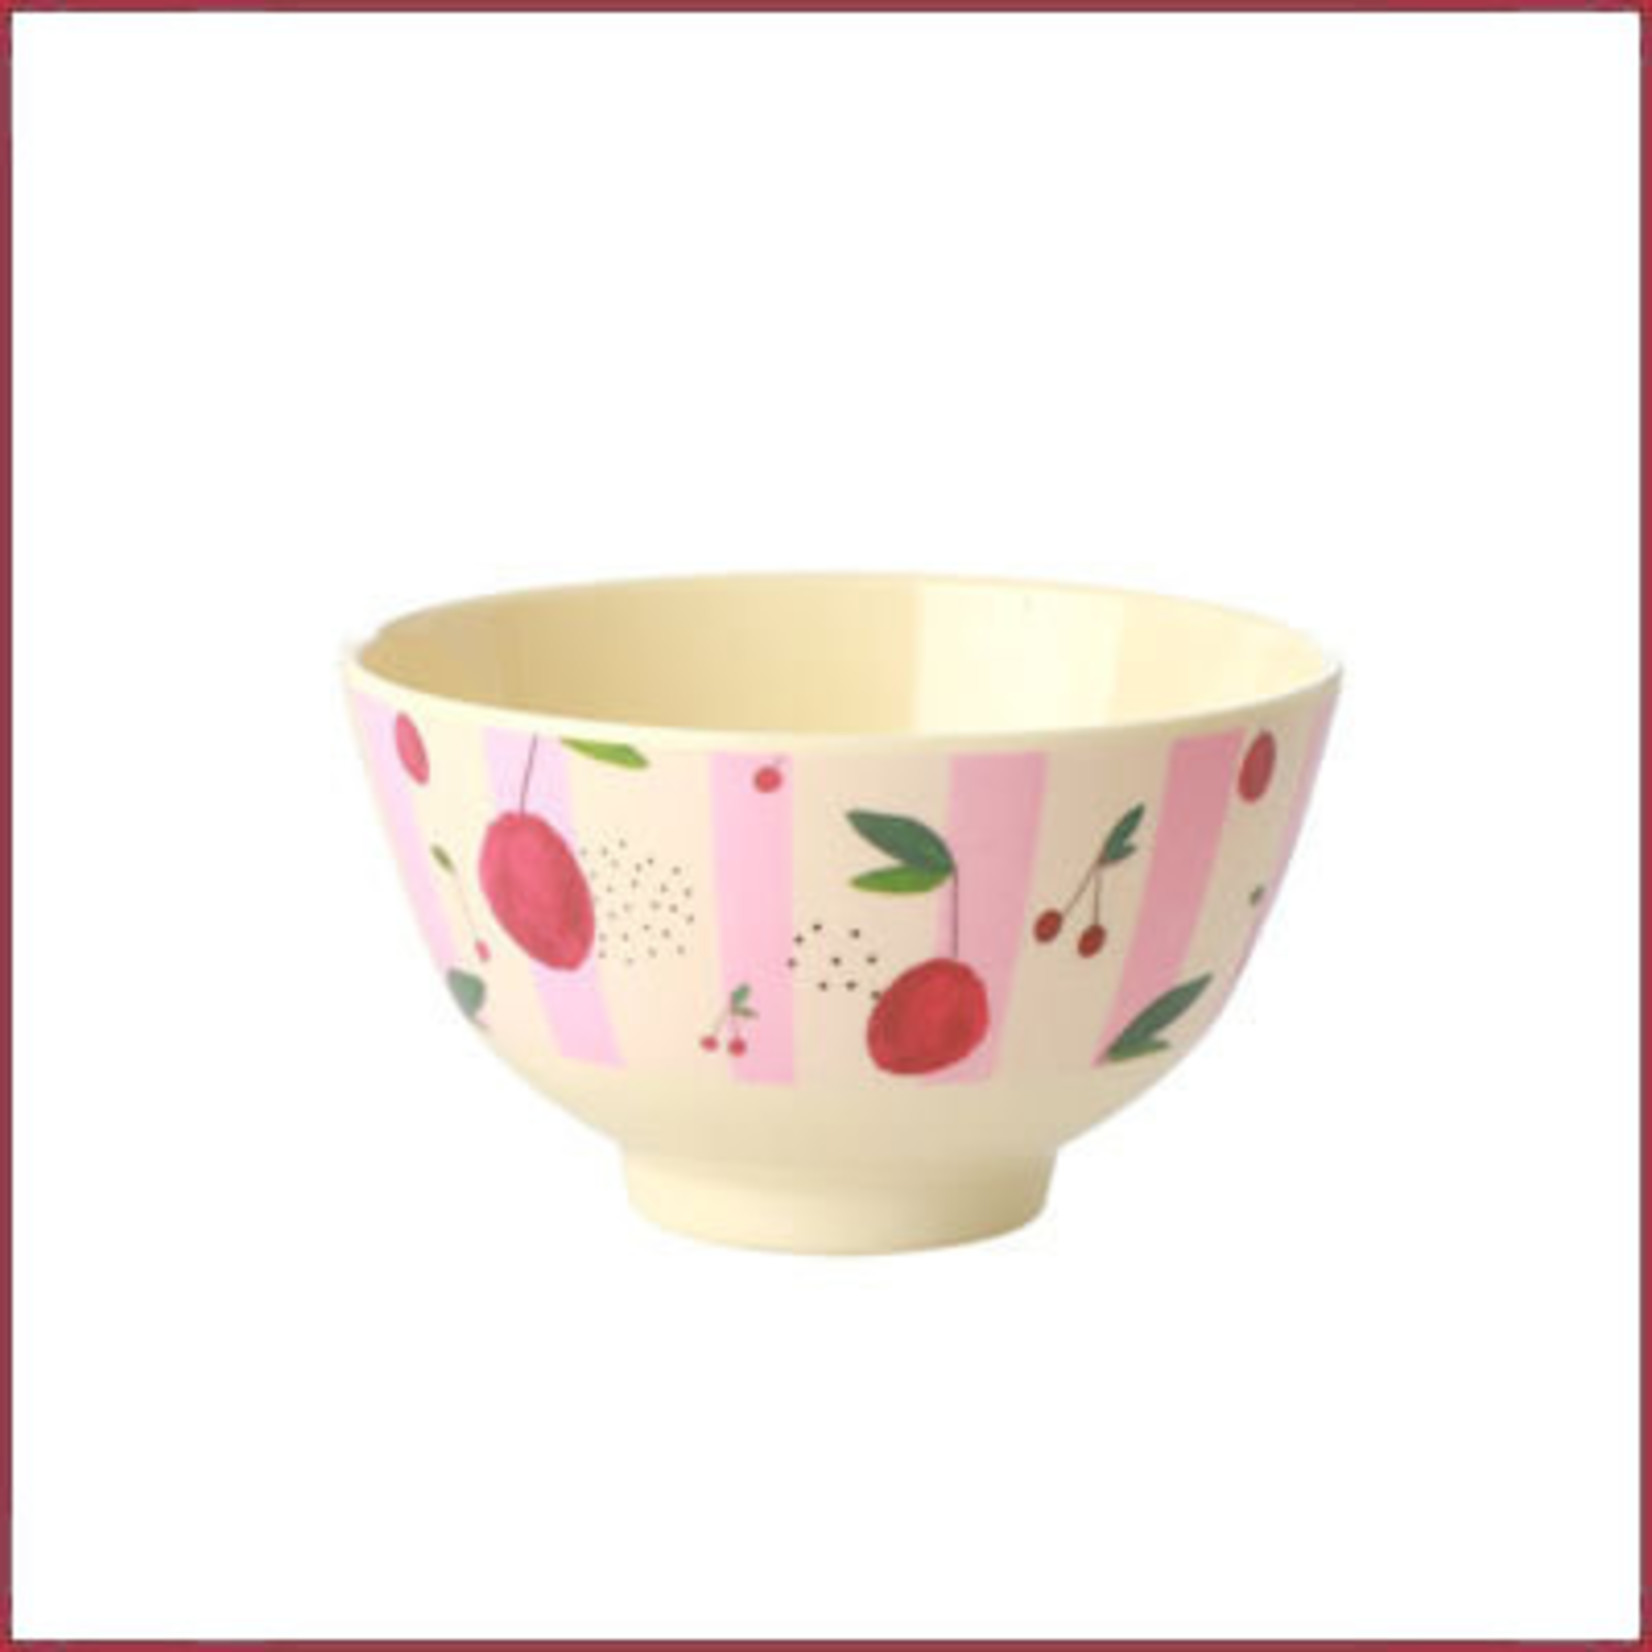 Rice Rice Bowl Small met Kersen Print